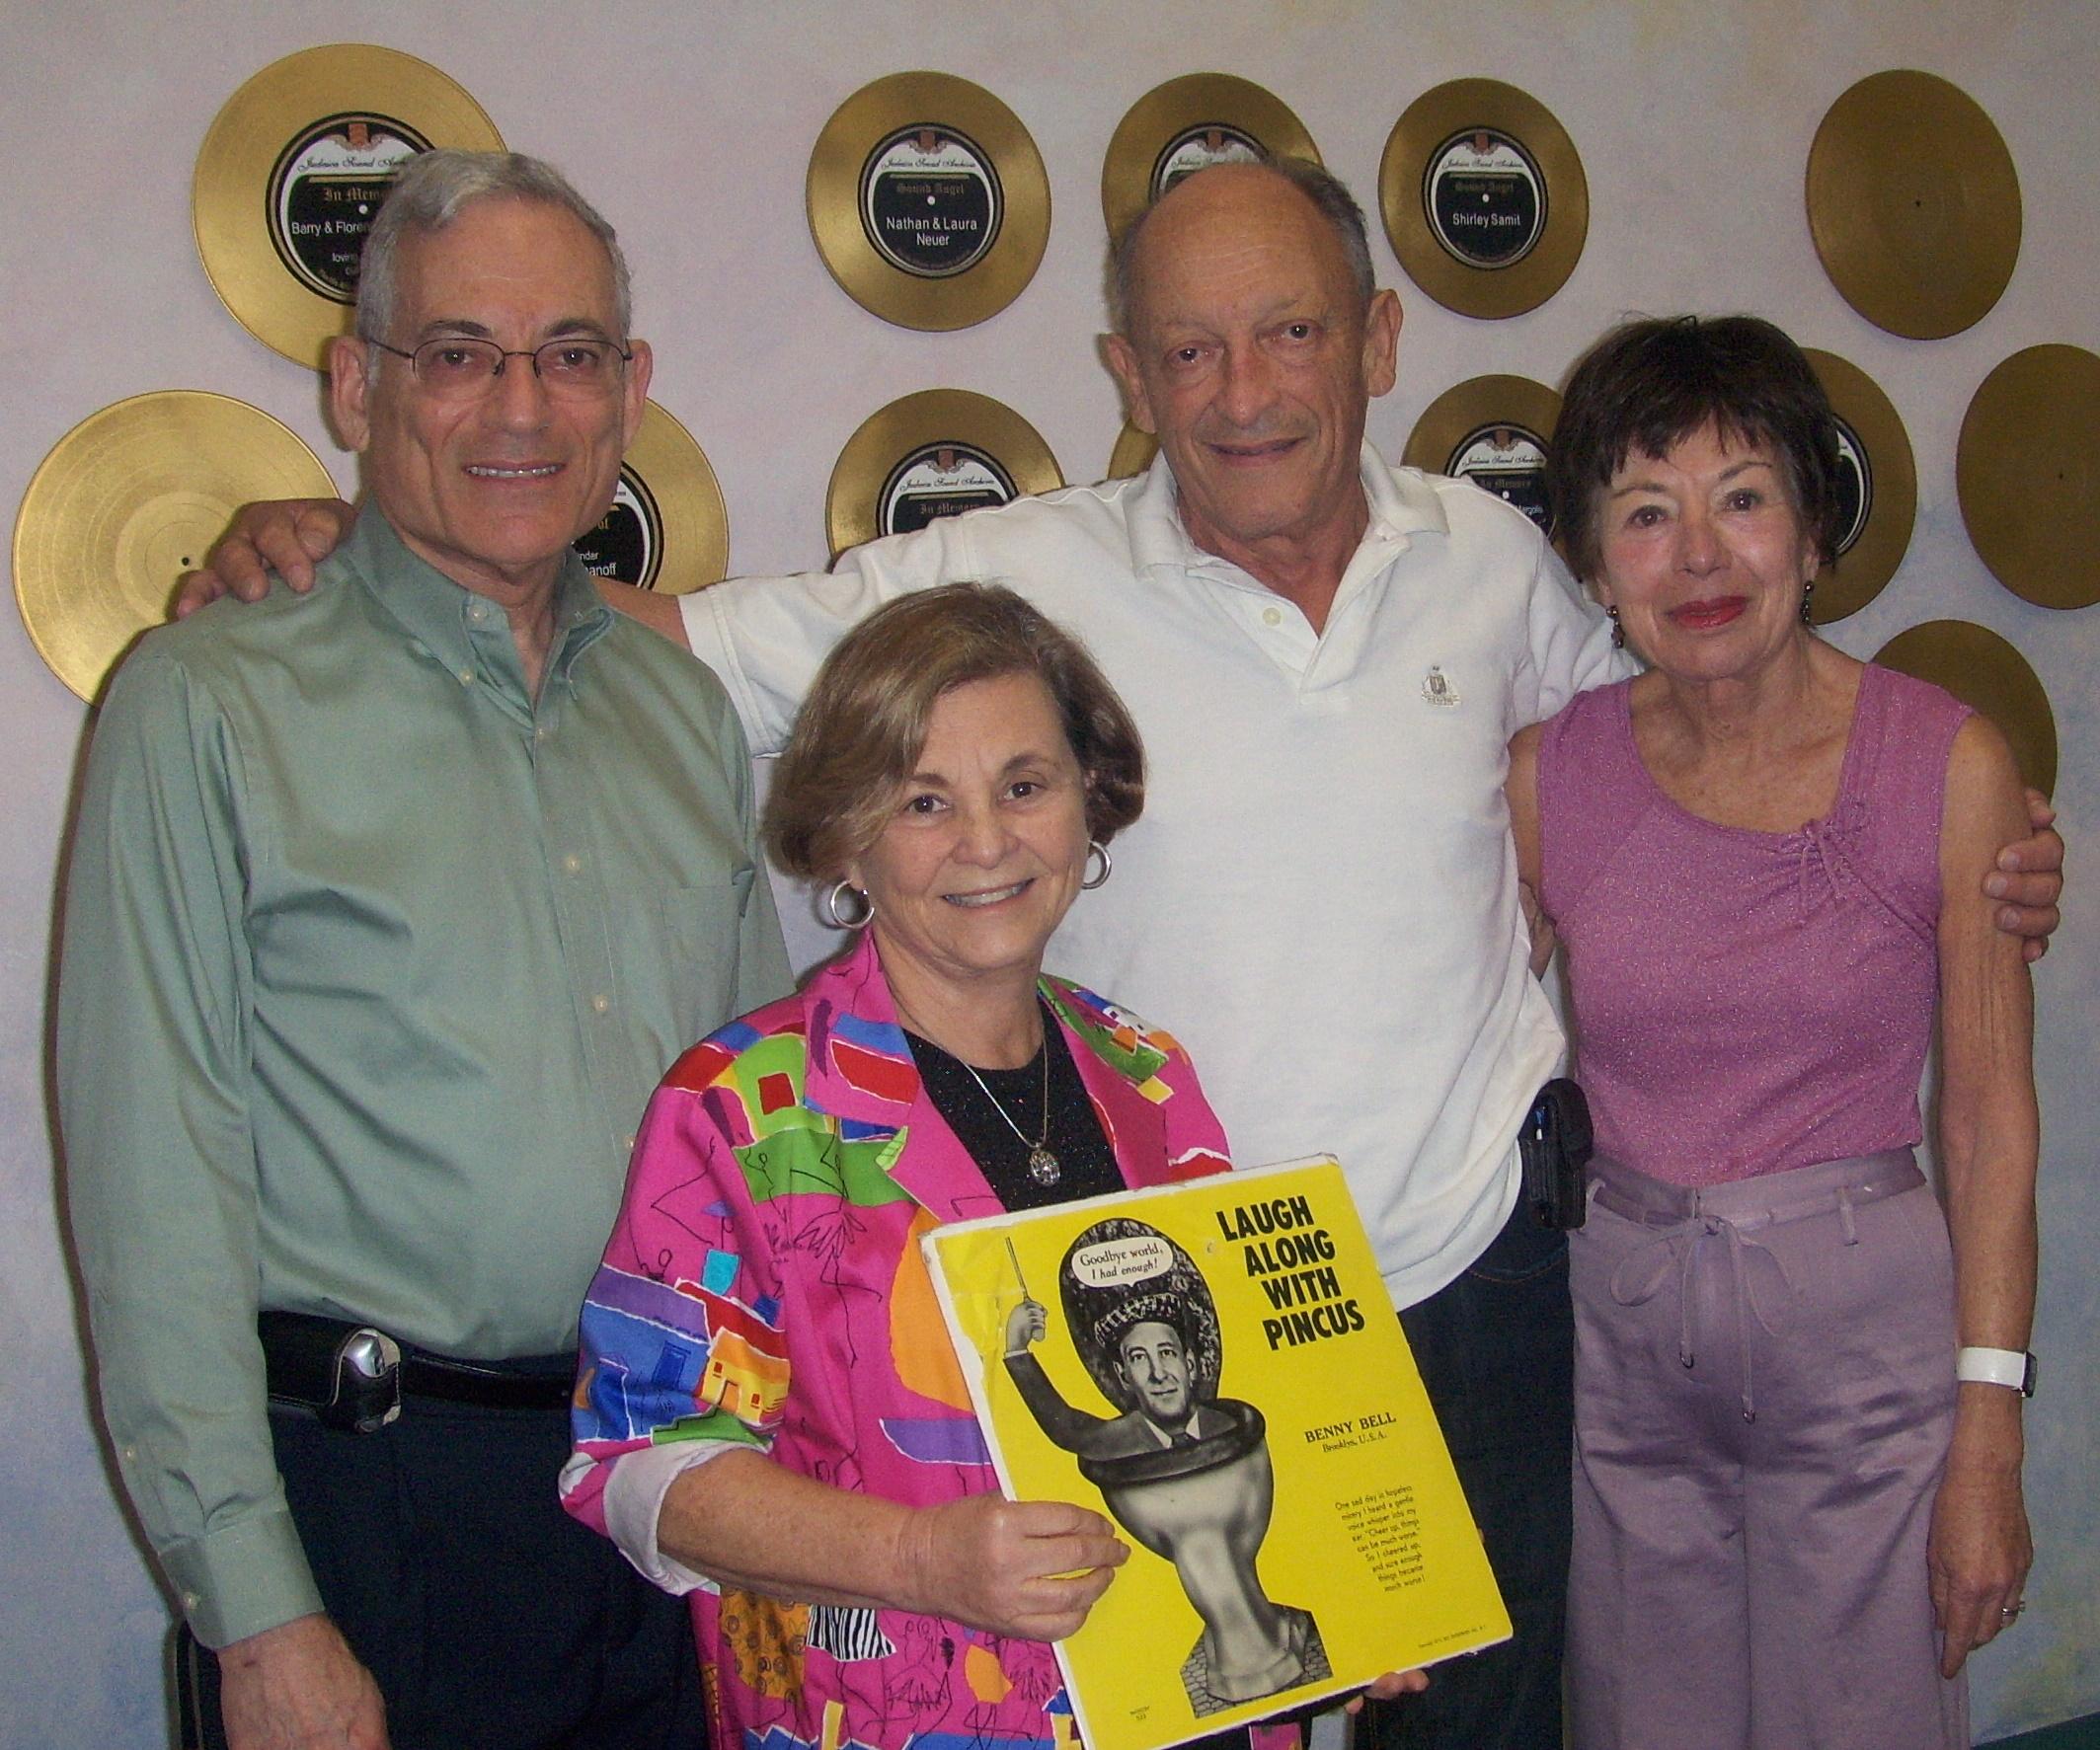 Left to Right: Nathan Tinanoff, Maxine Schackman, Chuck Samburg, Gloria